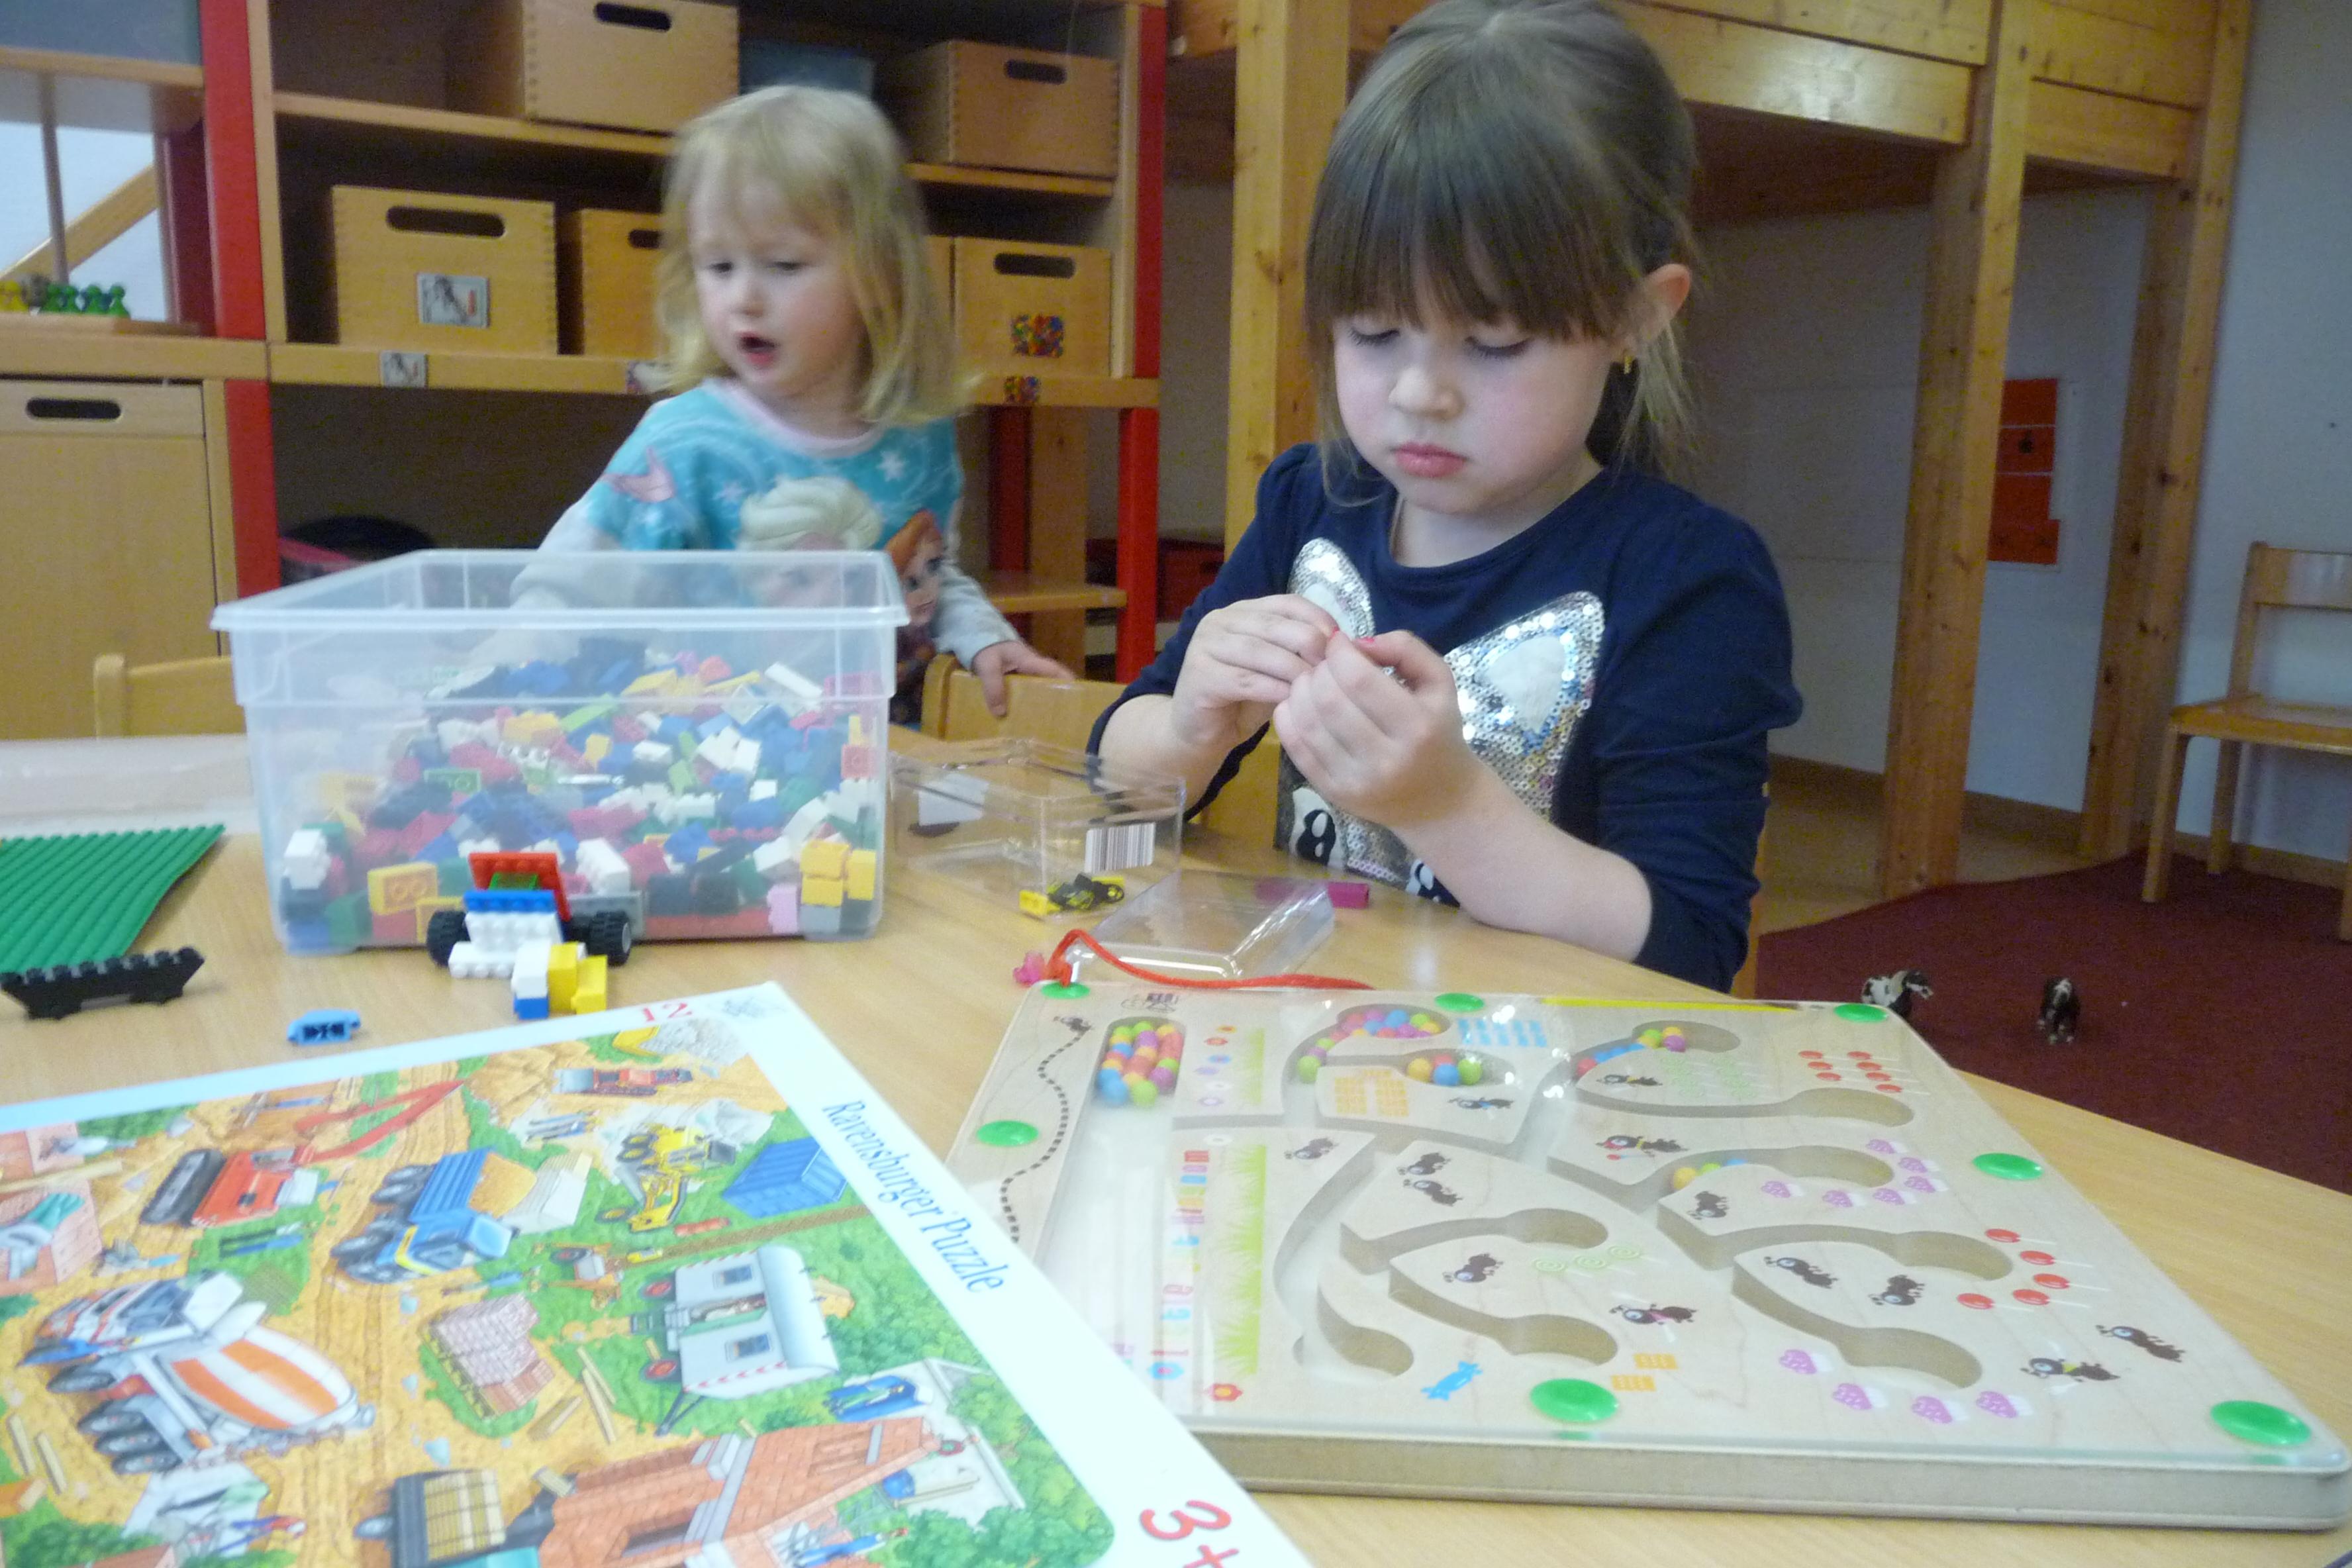 Evangelischer kindergarten regenbogen 74722 buchen for Evangelischer kindergarten